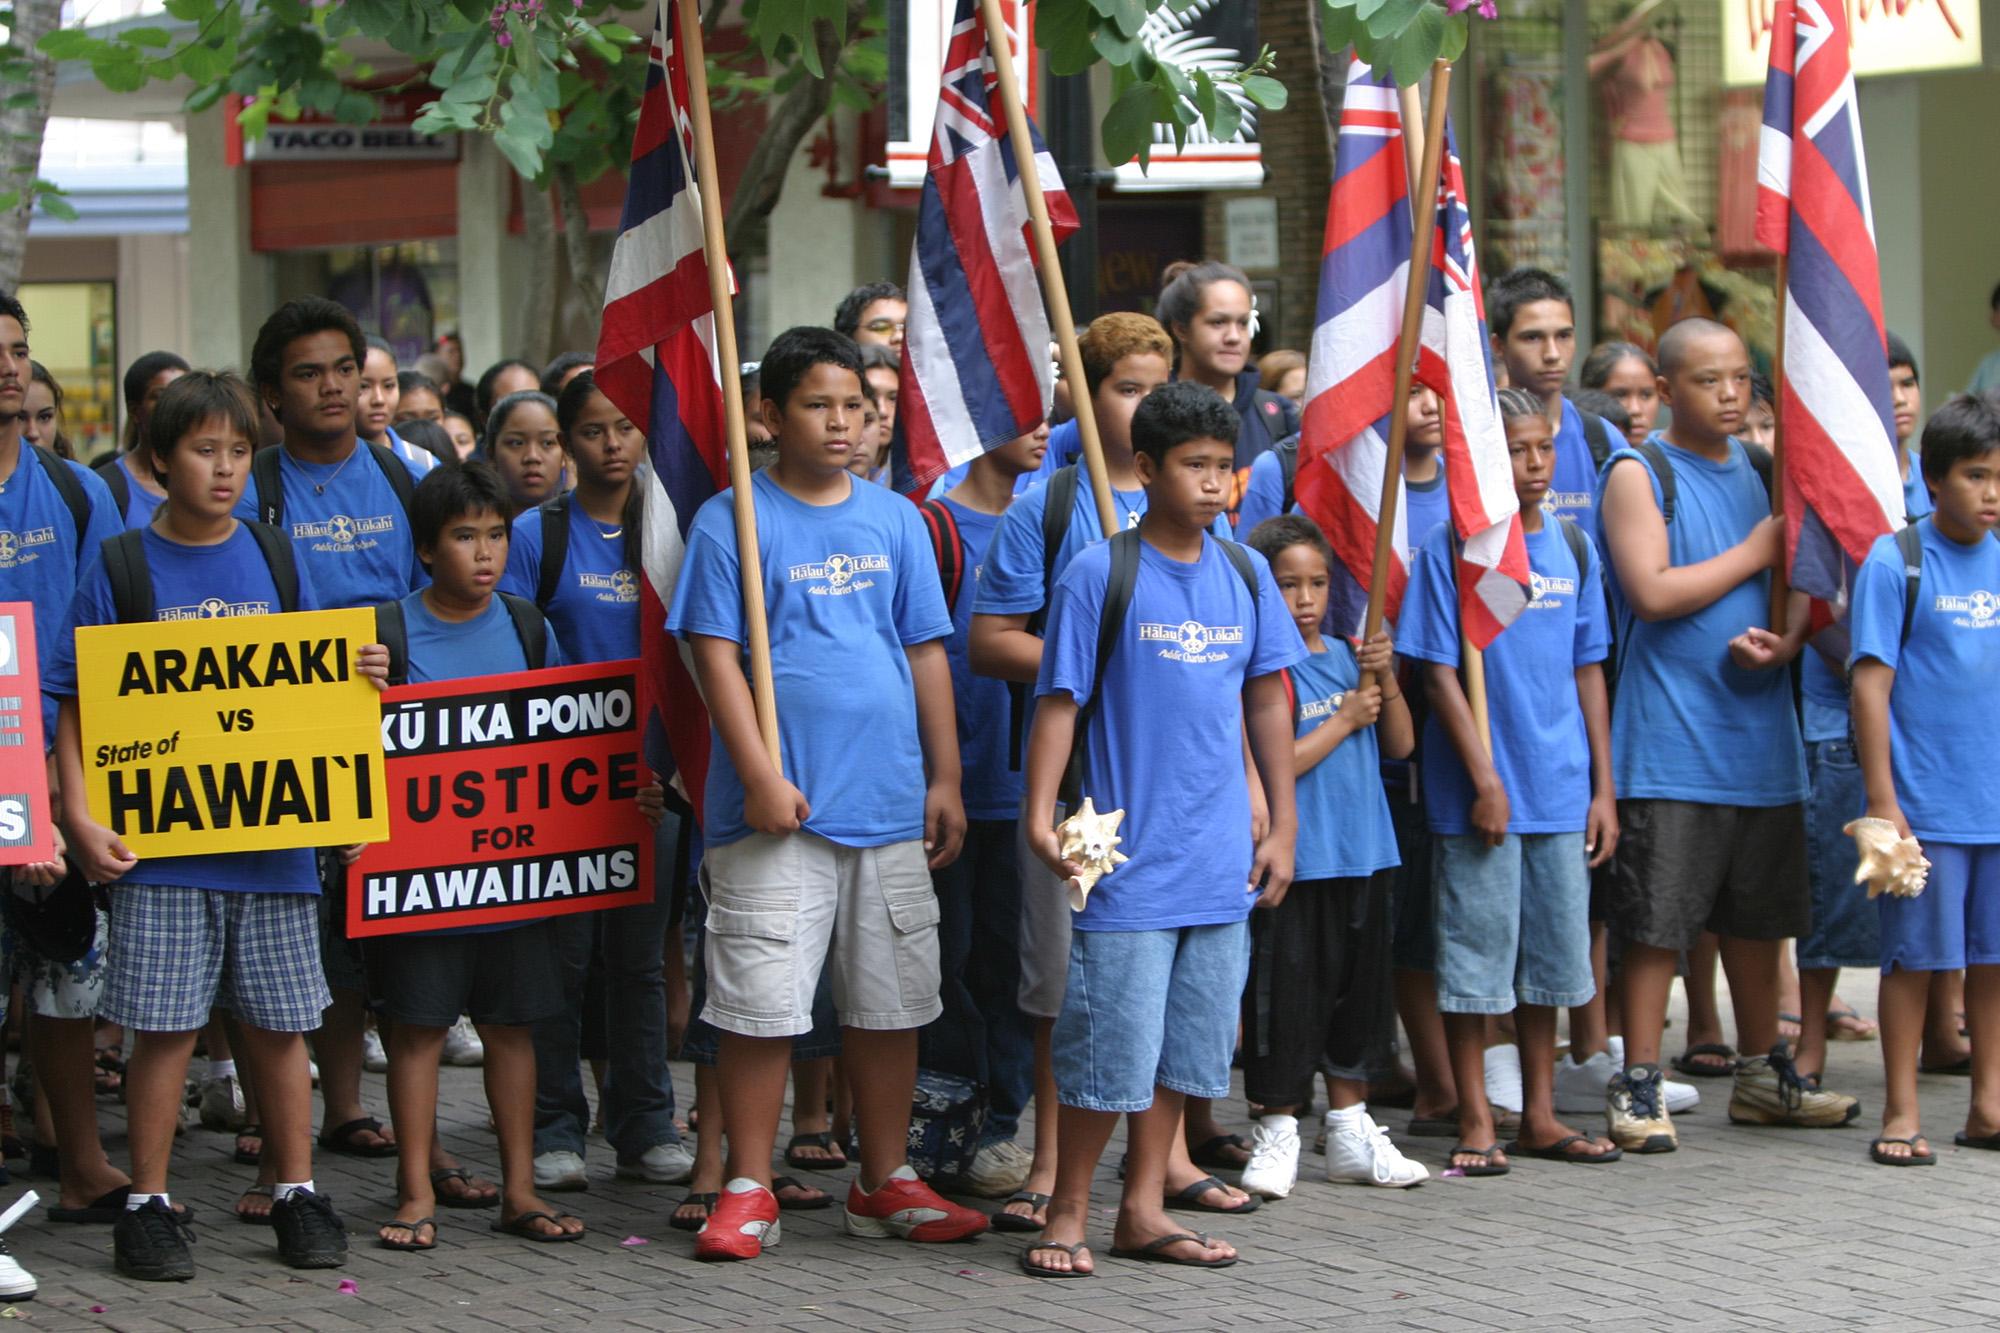 [Students in action] Hālau Lōkahi charter school